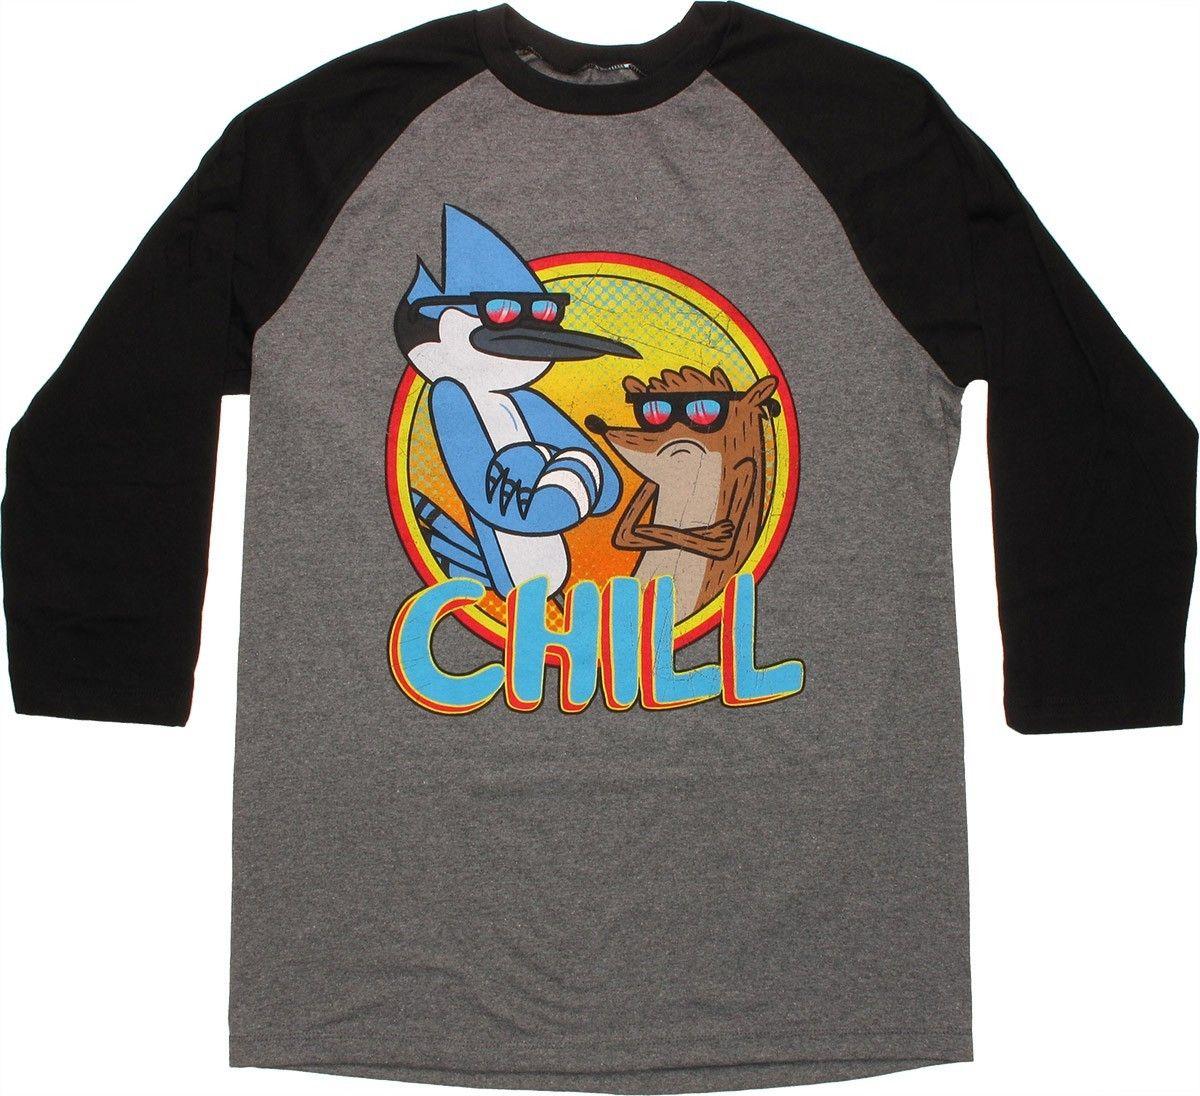 Regular Show Chill 3 4 Raglan T Shirt Delicious Clothing Shirts